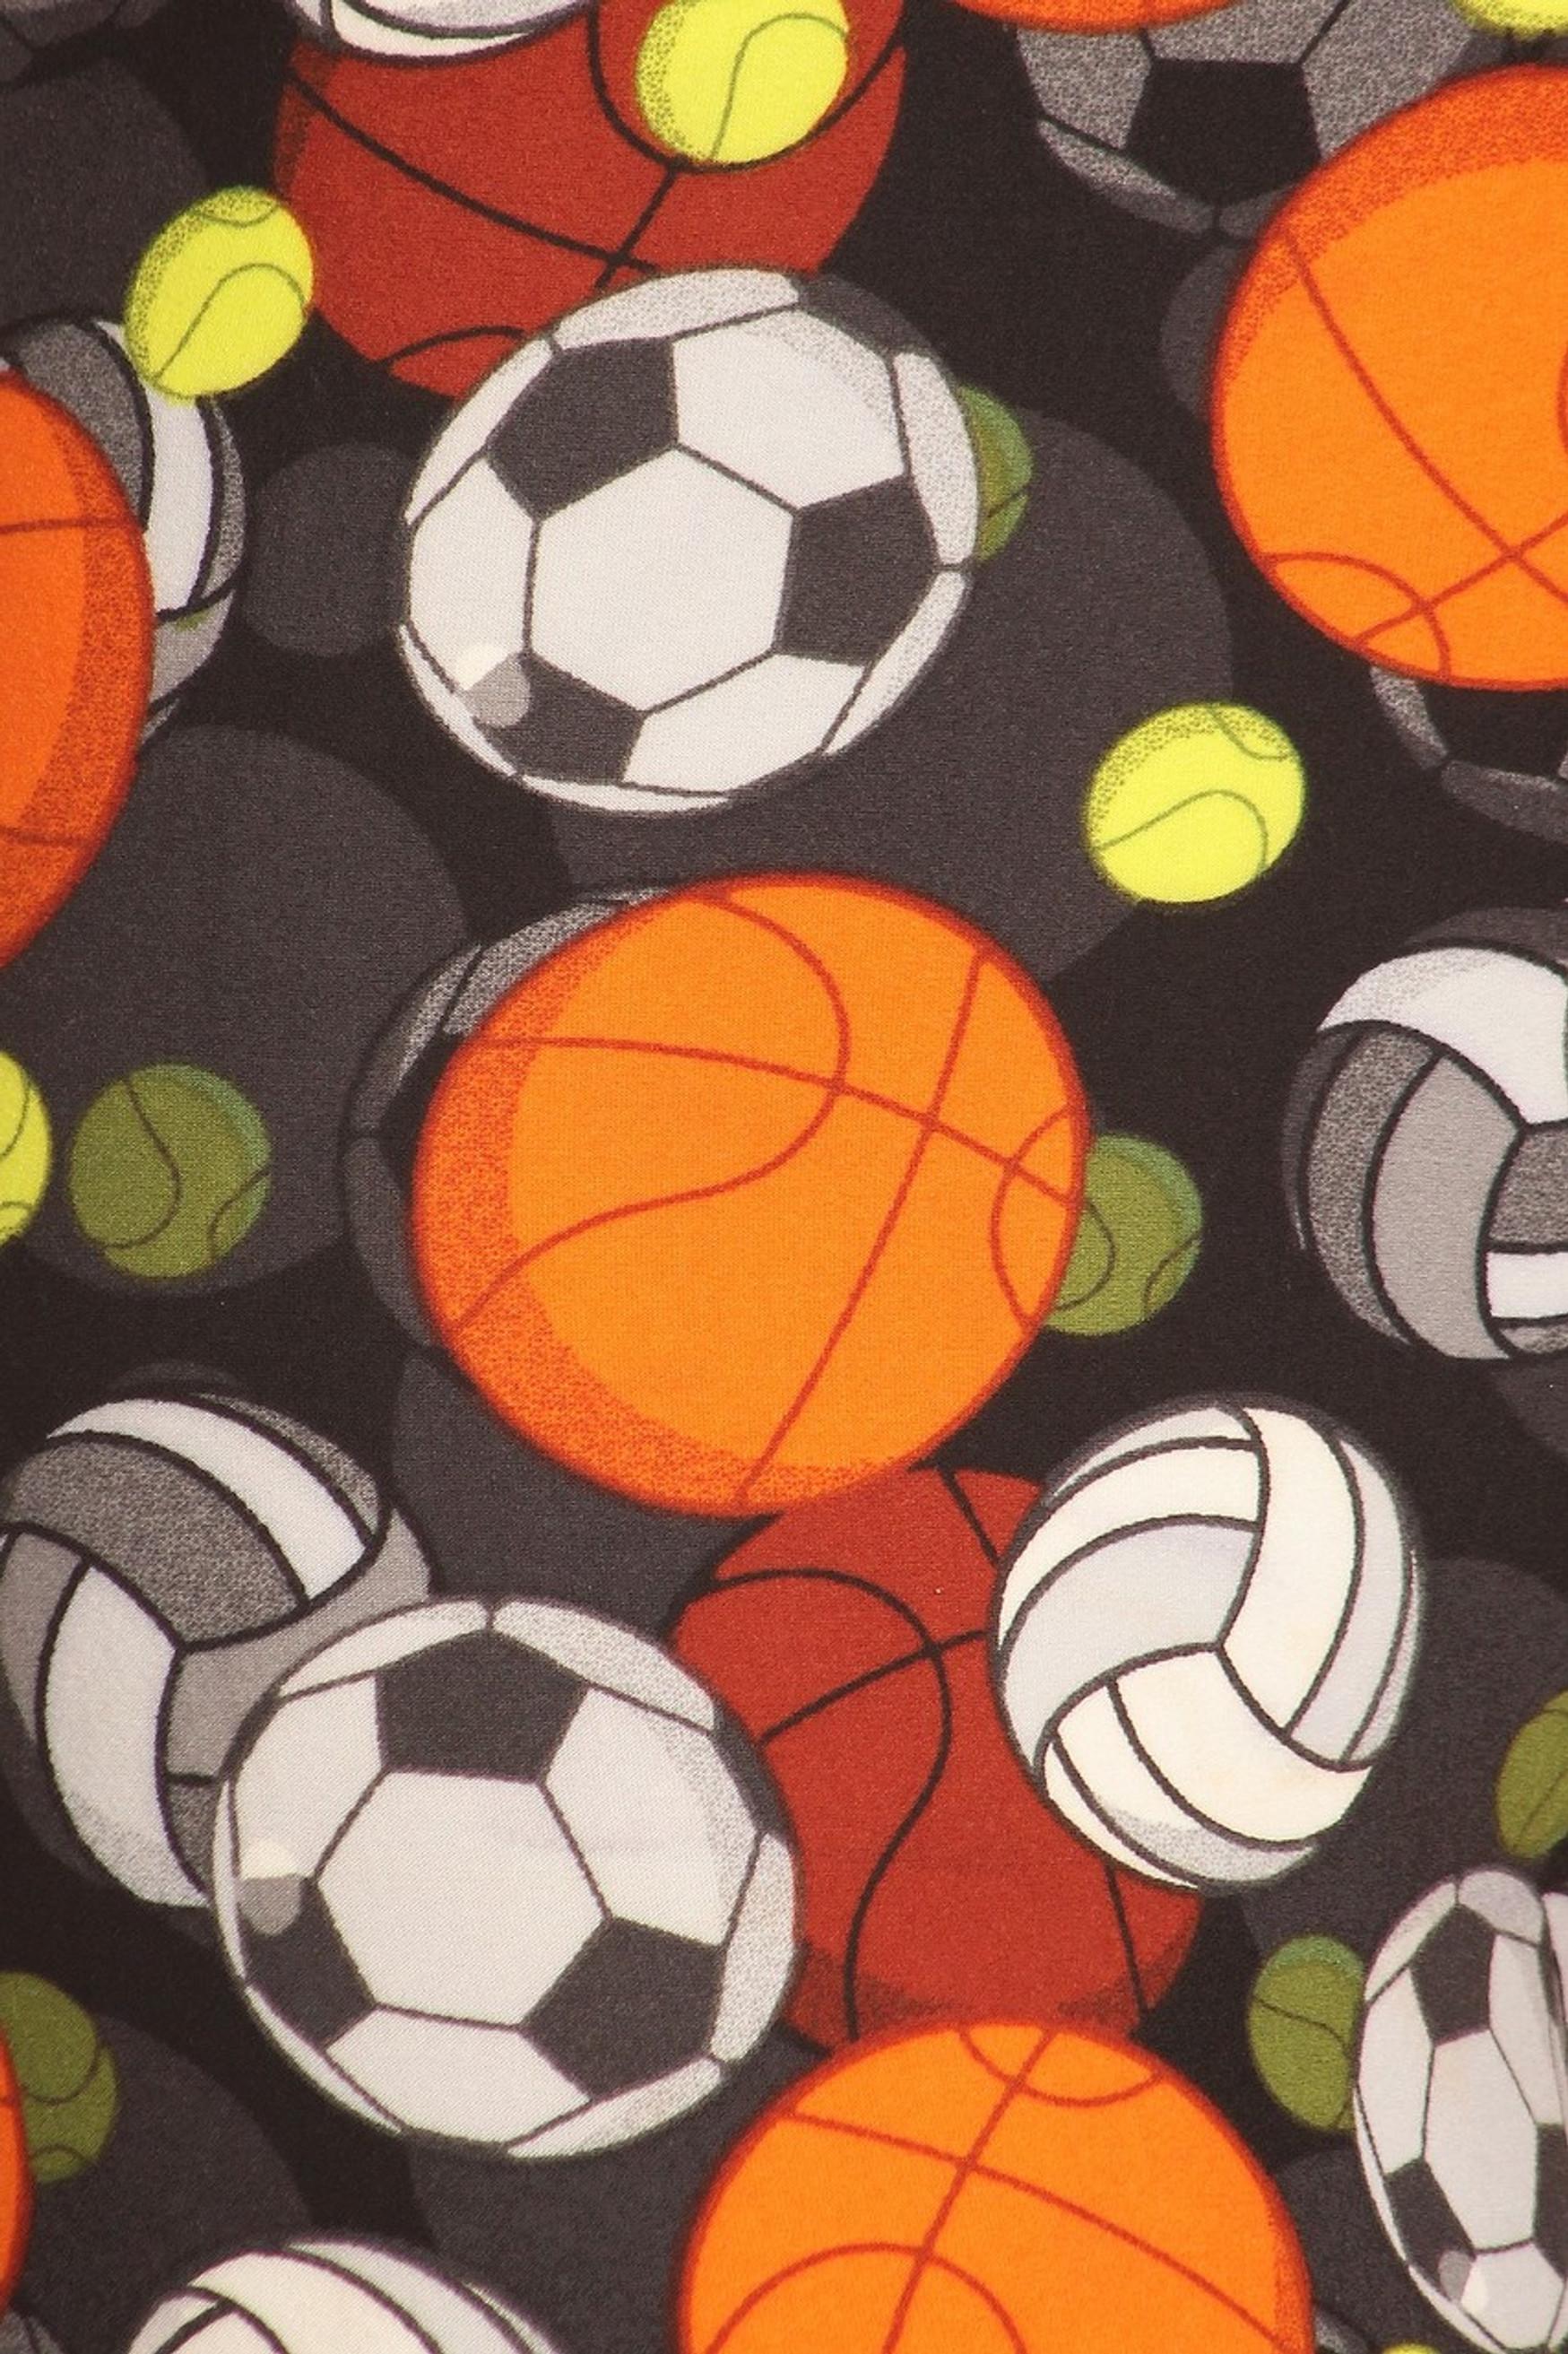 Brushed  Sports Ball Extra Plus Size Leggings - 3X-5X